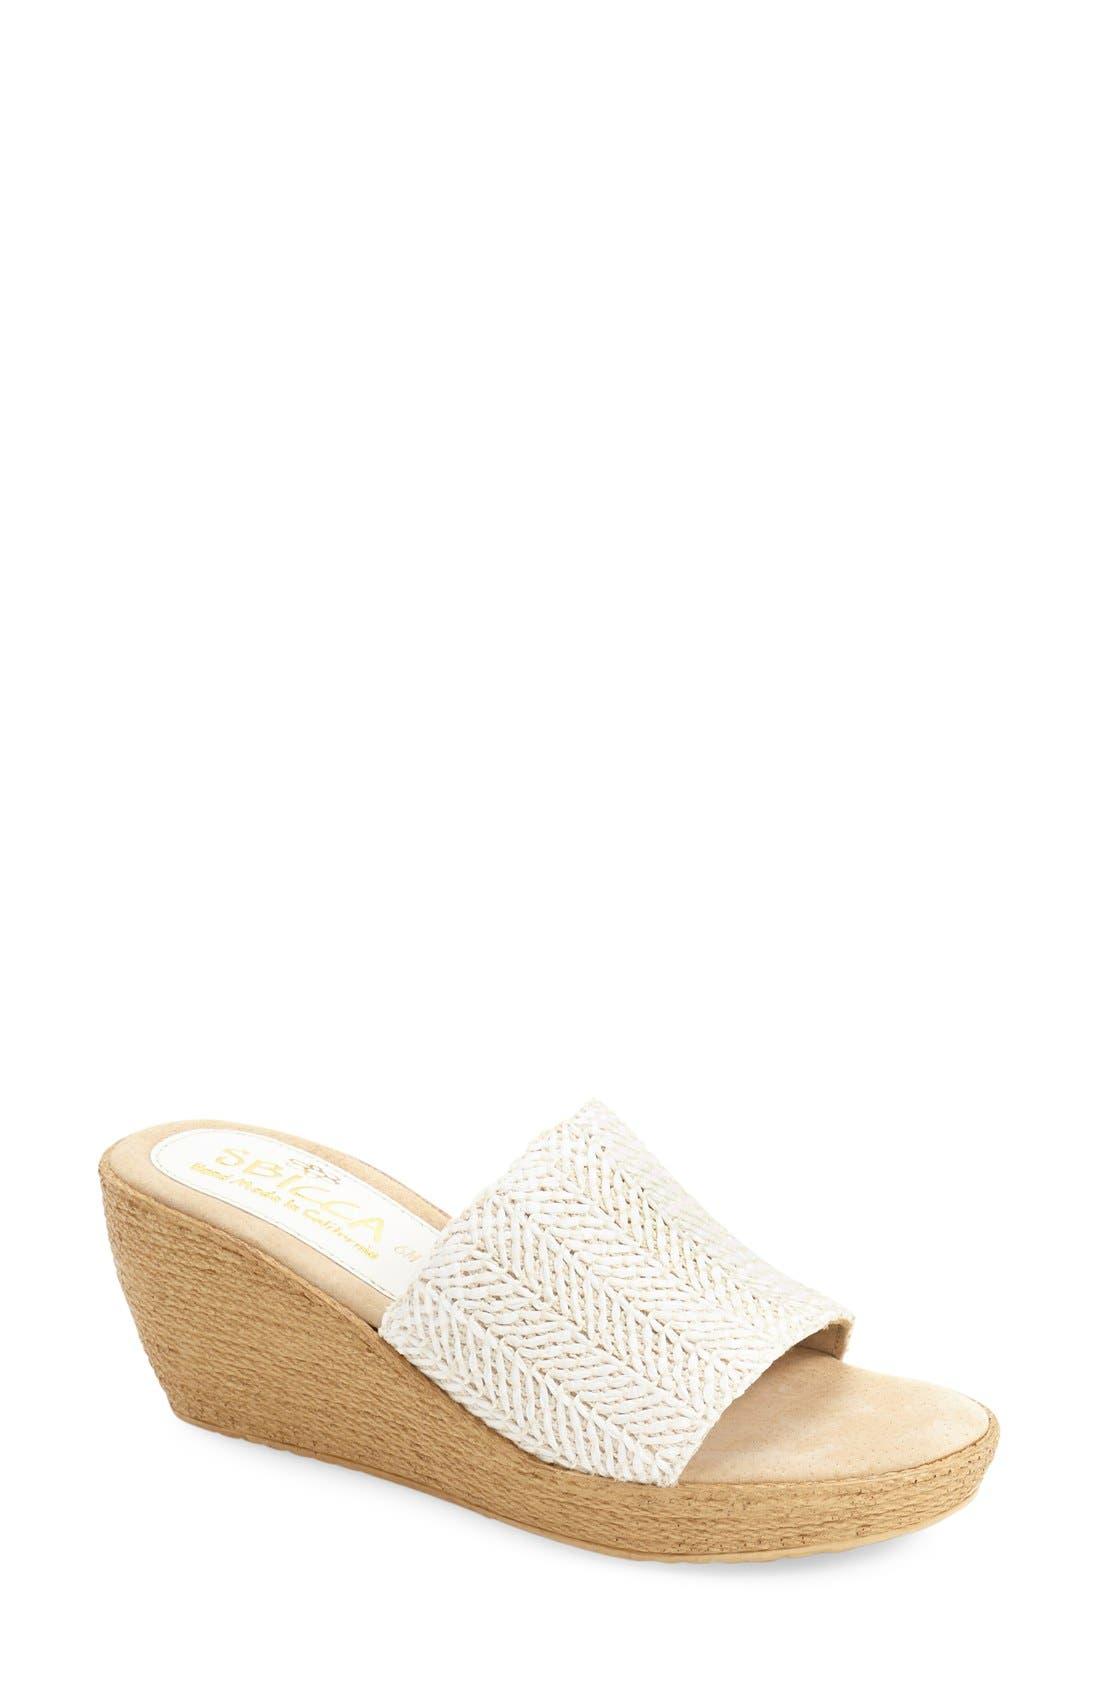 Main Image - Sbicca 'Fiorella' Sandal (Women)